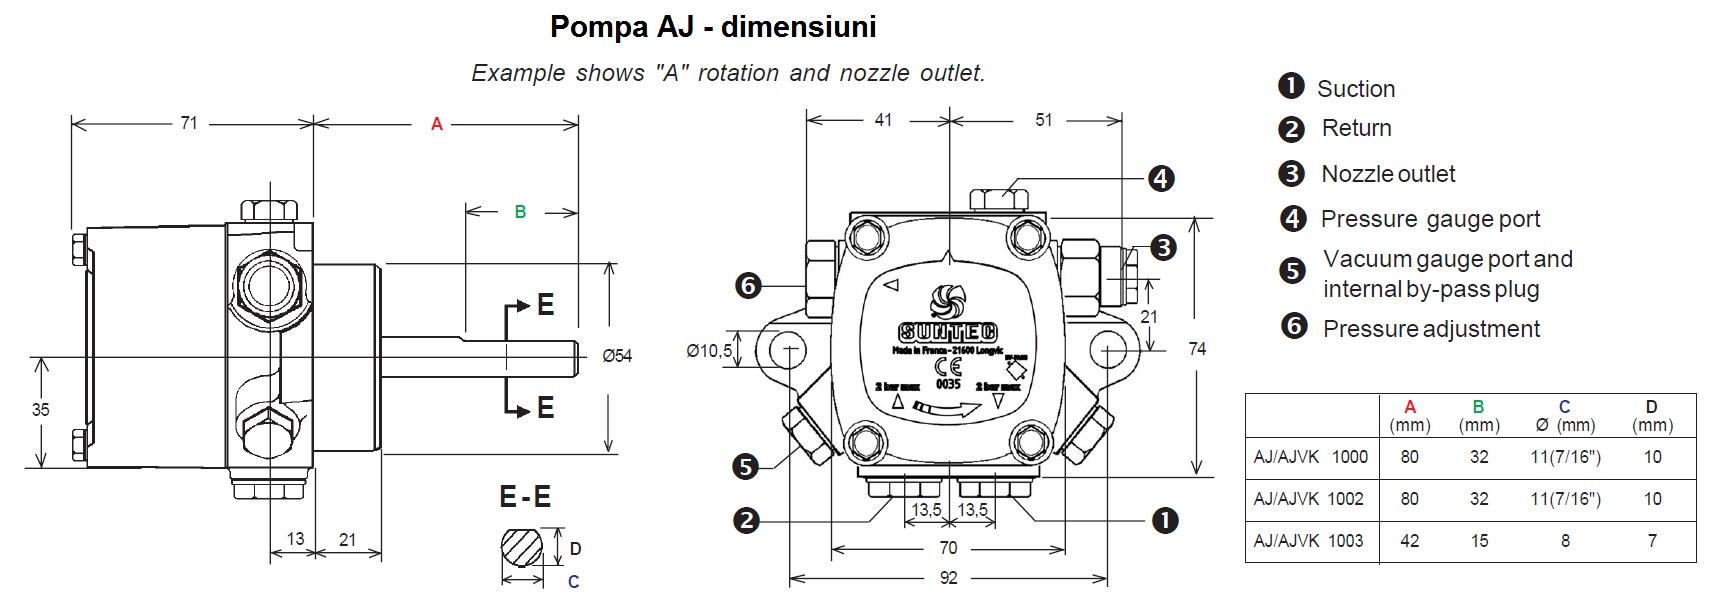 Pompa combustibil SUNTEC AJ - dimensiuni